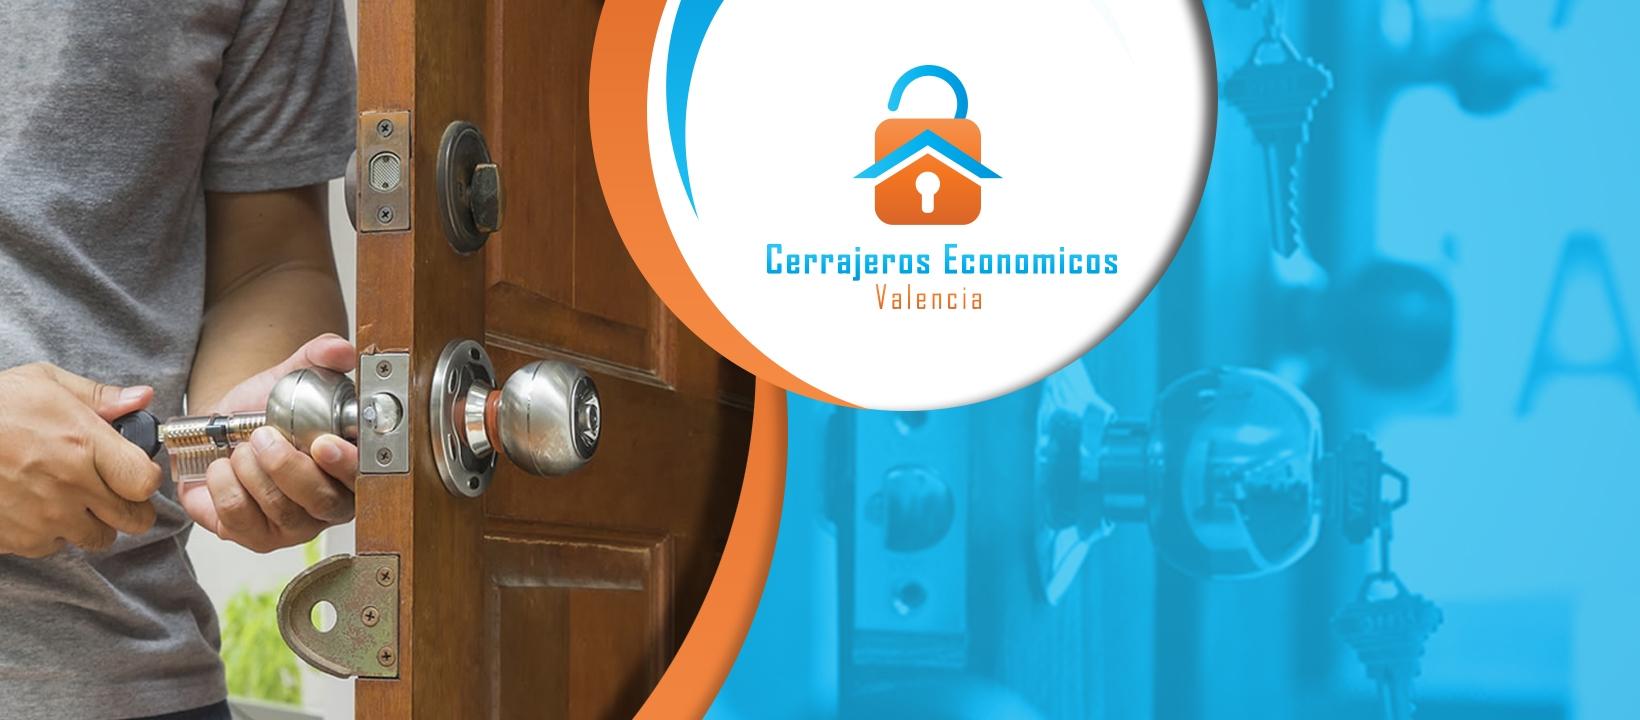 cerrajeros Economicos Valencia (@cerrajeros) Cover Image